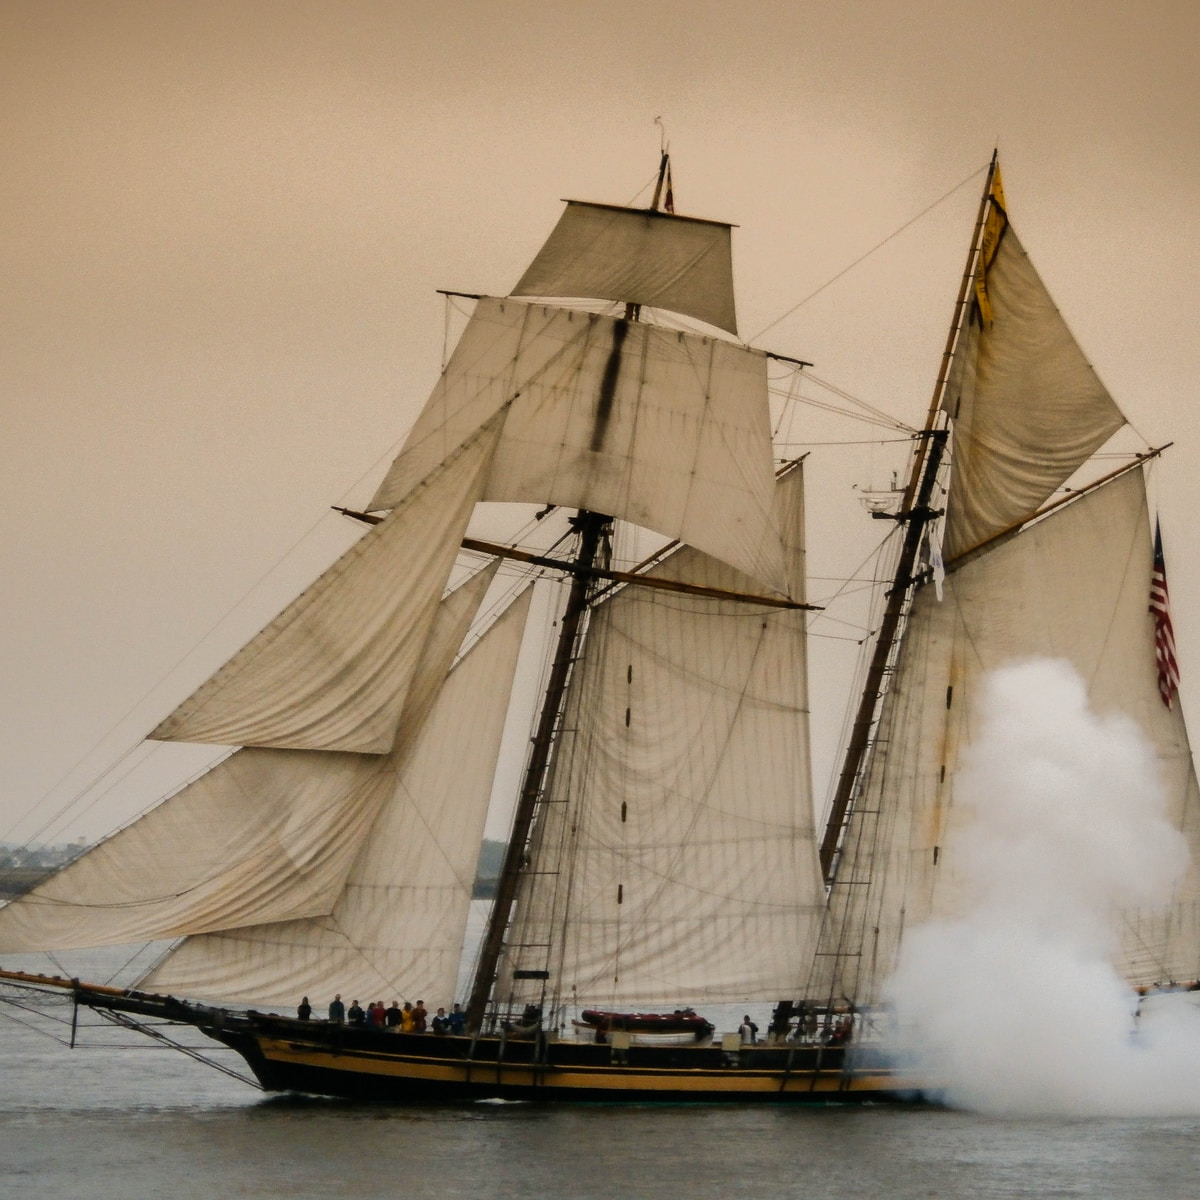 gusanos de barco, brown and black galleon ship on ocean water under gray sky